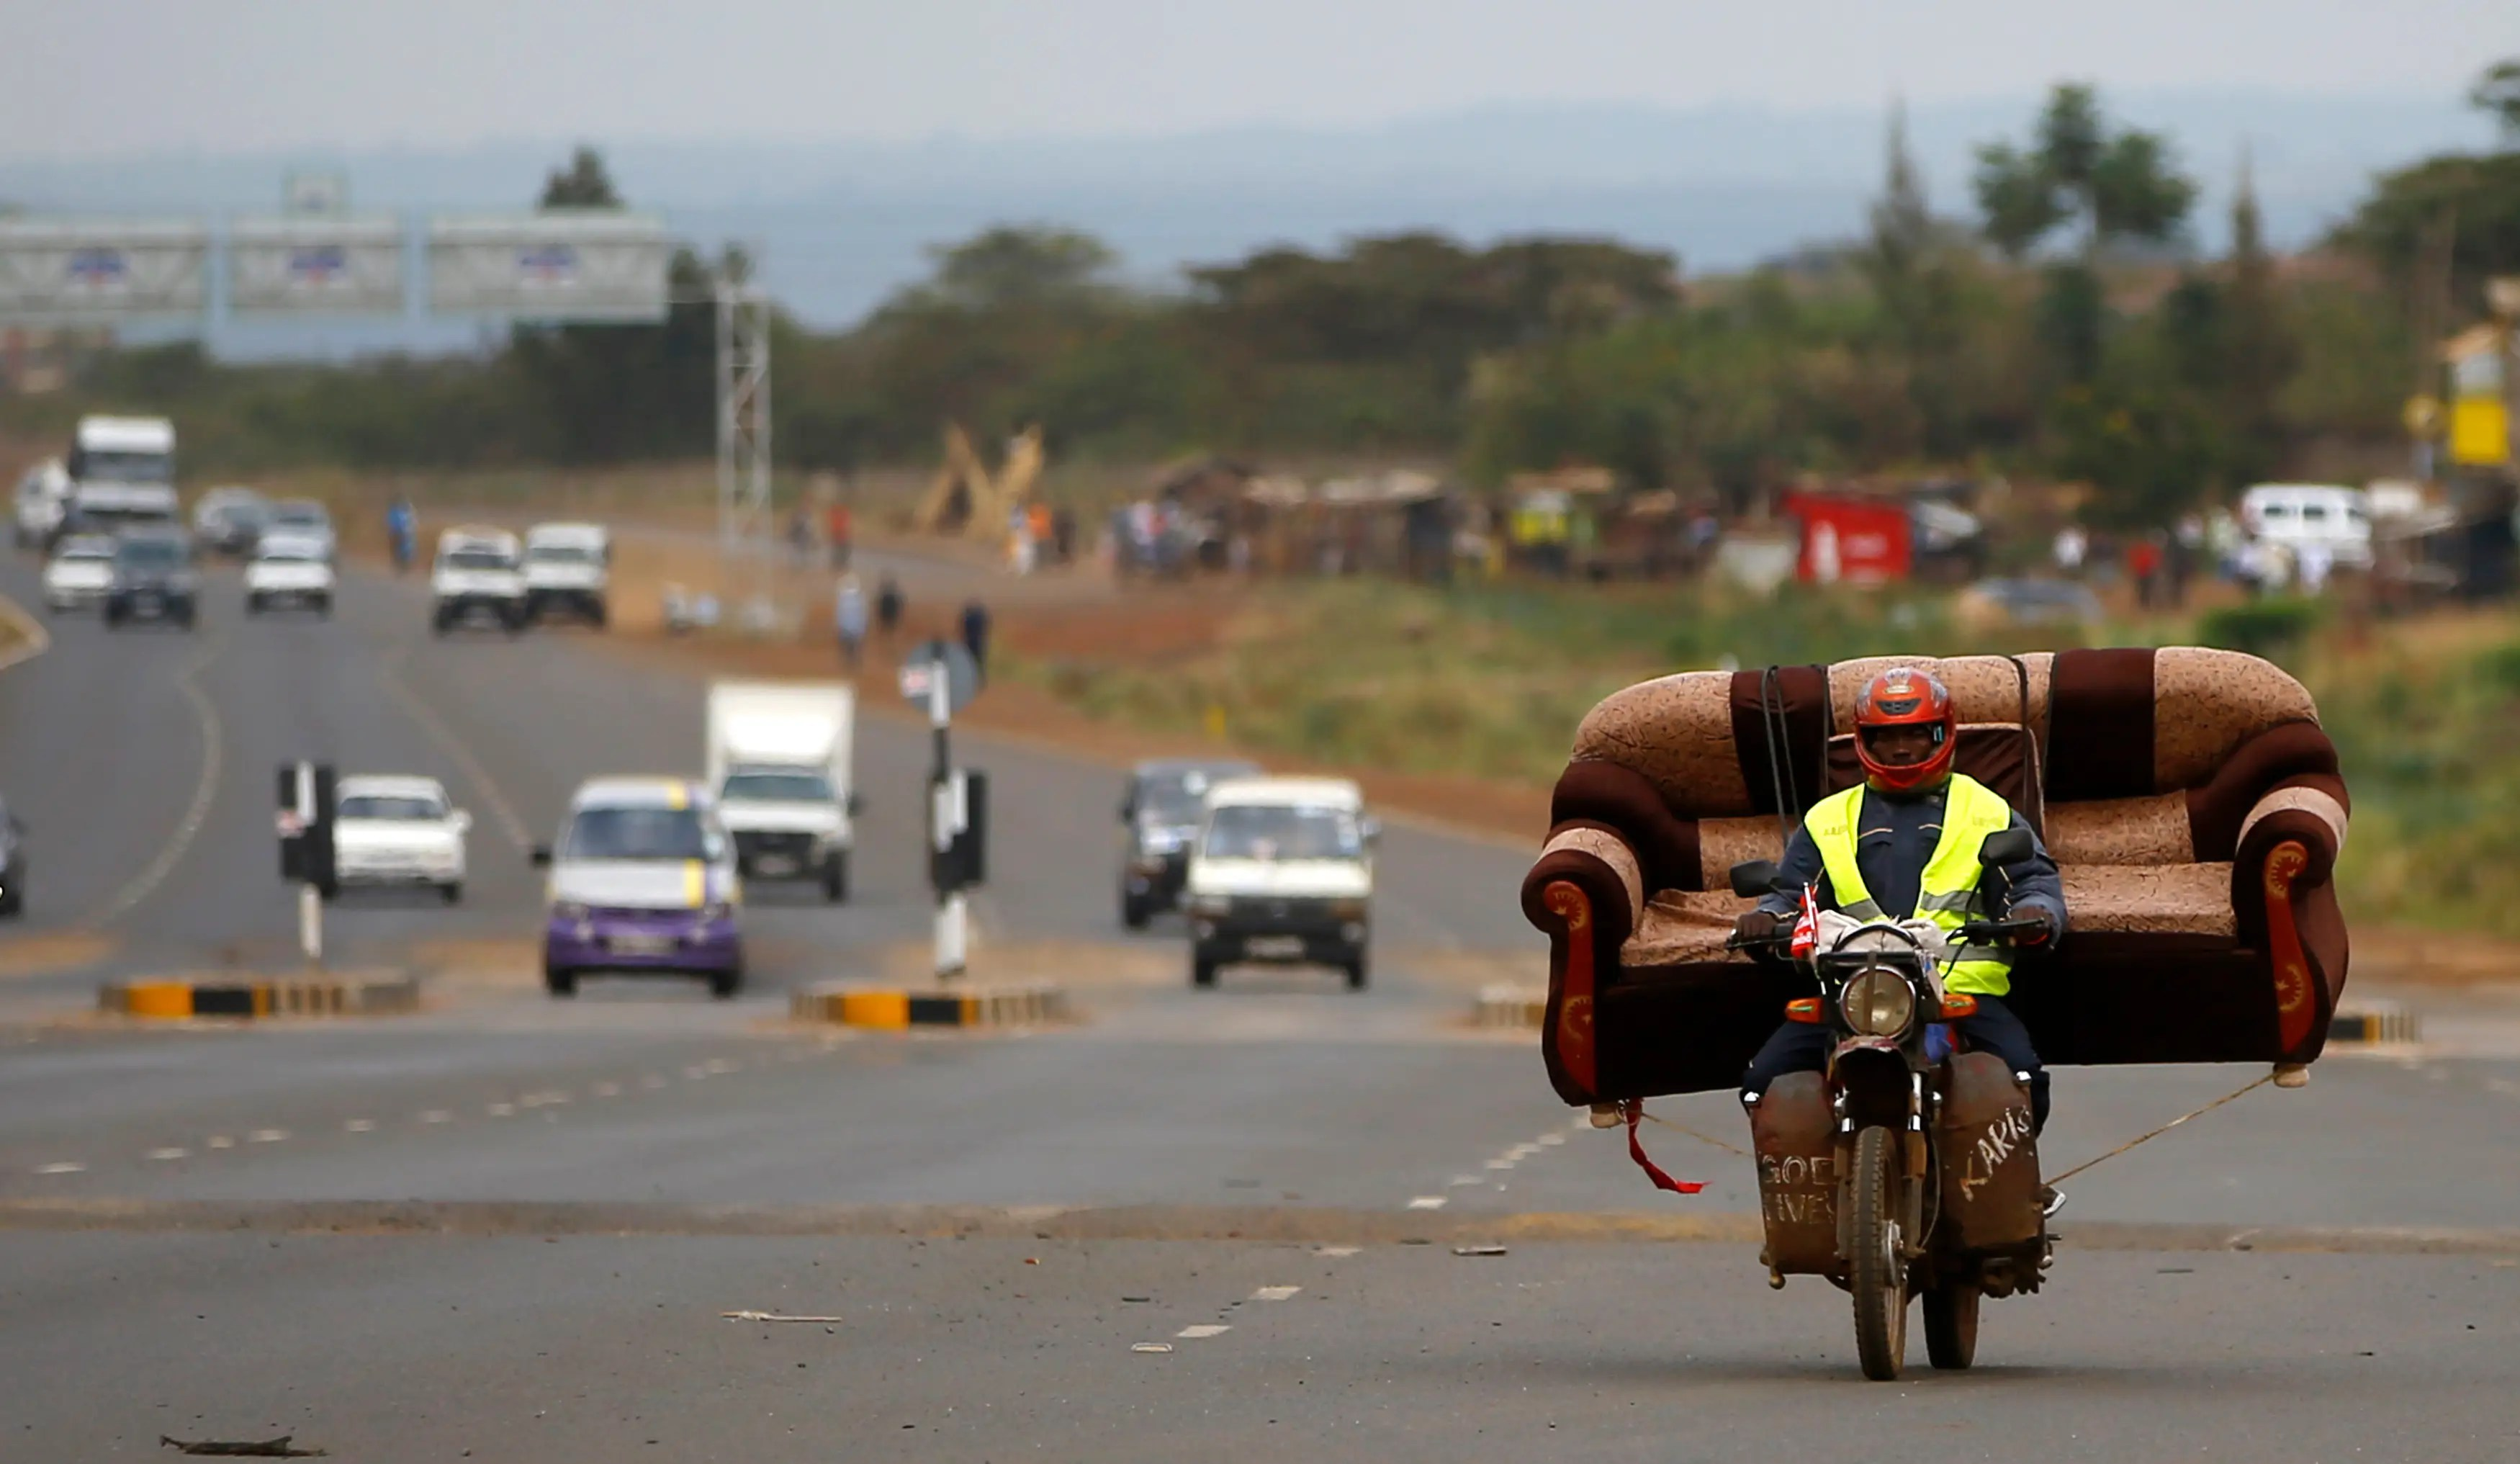 In Nairobi, Kenya, a man carries sofa on motorcycle.